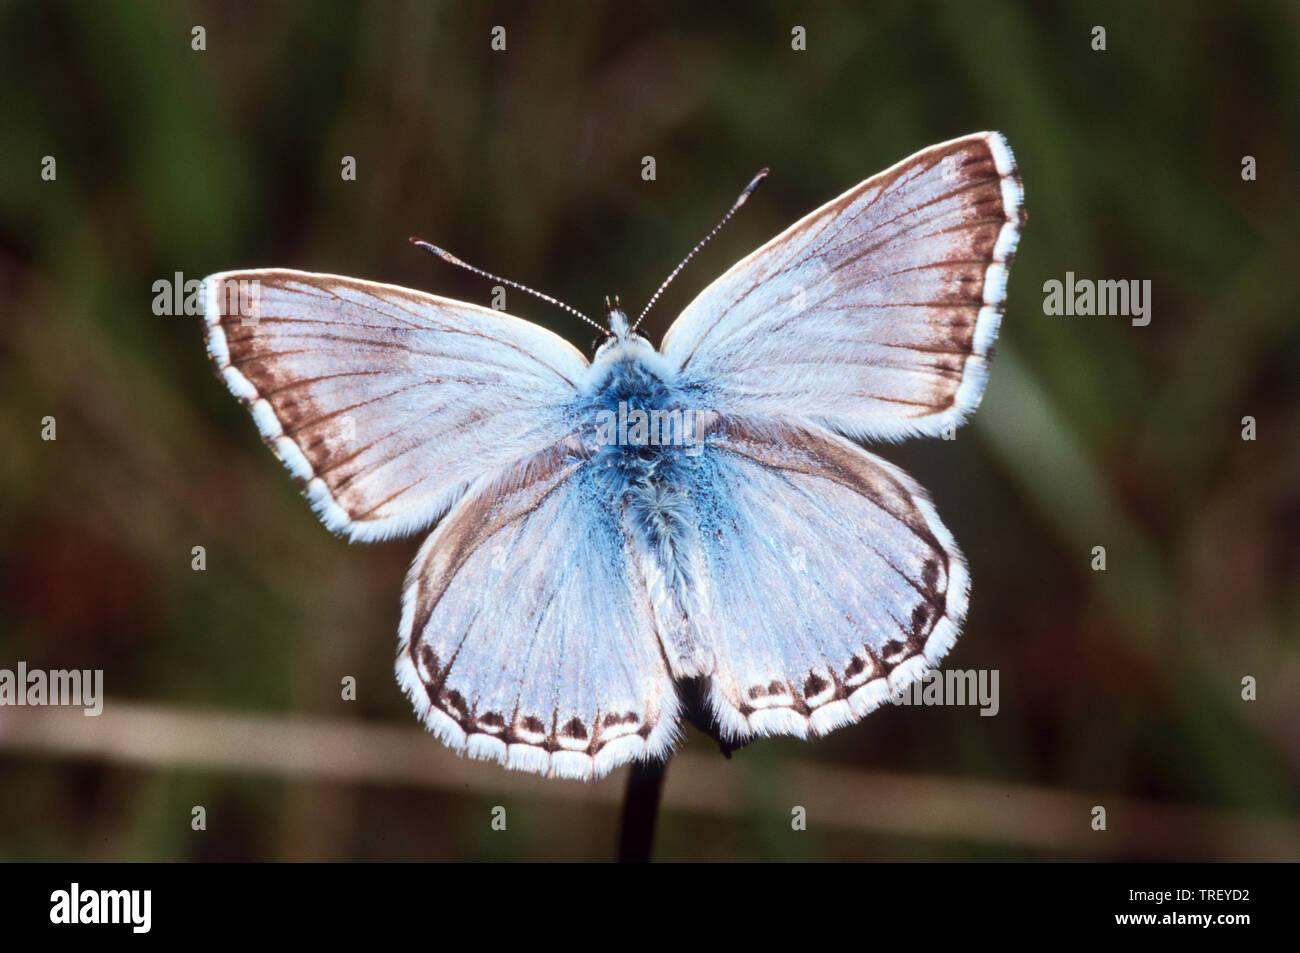 Chalkhill Blue (Polyommatus coridon). Butterfly on a stalk. Germany - Stock Image